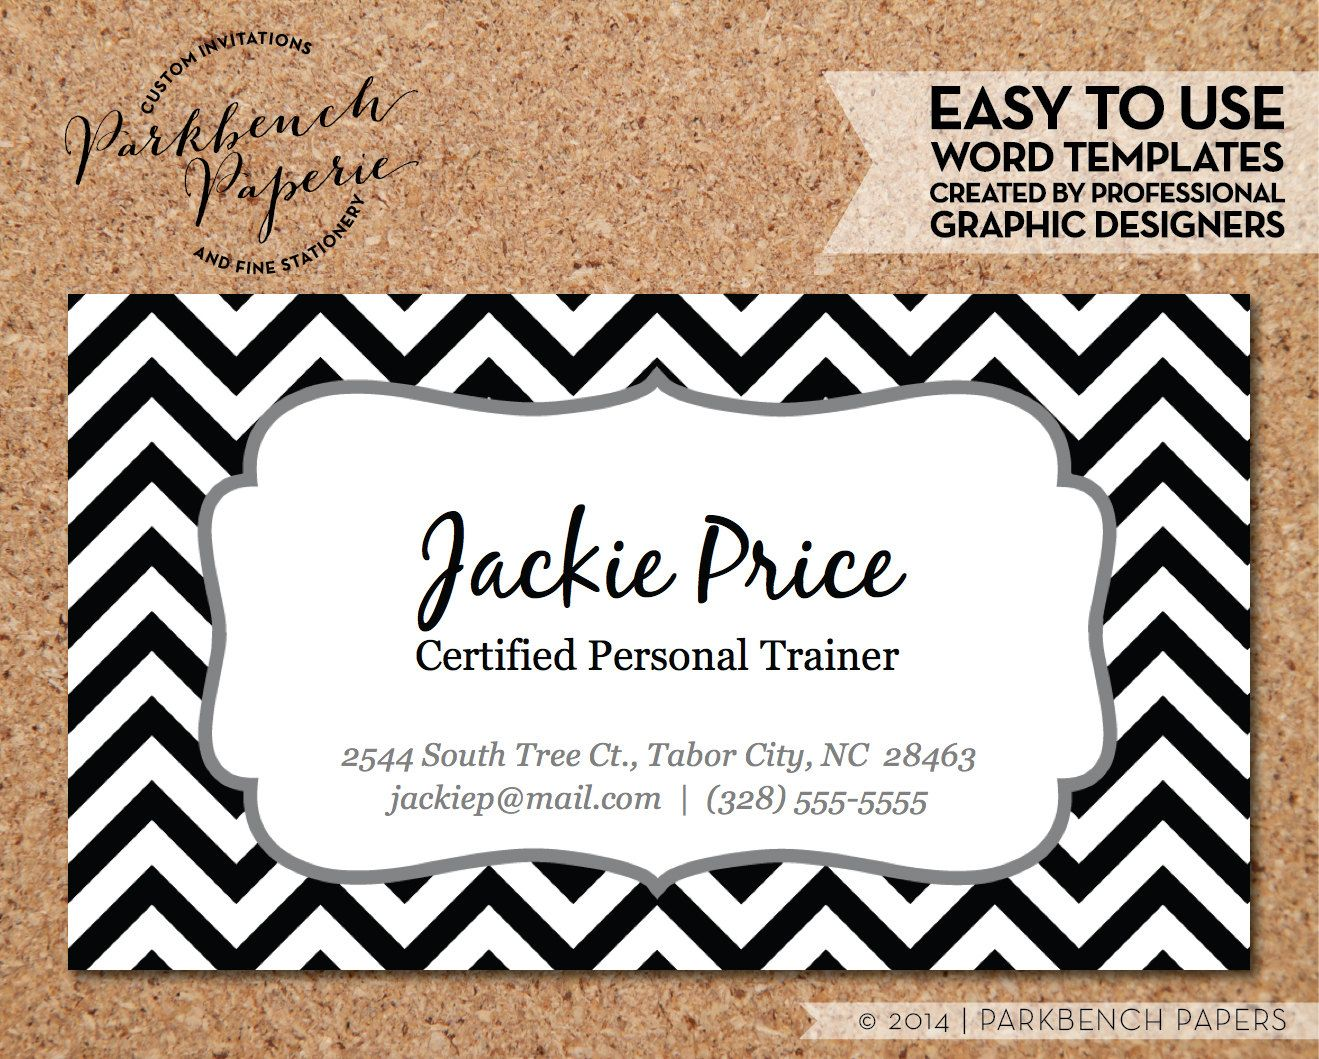 Business Card Template Black Chevron Frame DIY Editable Word - Diy business card template